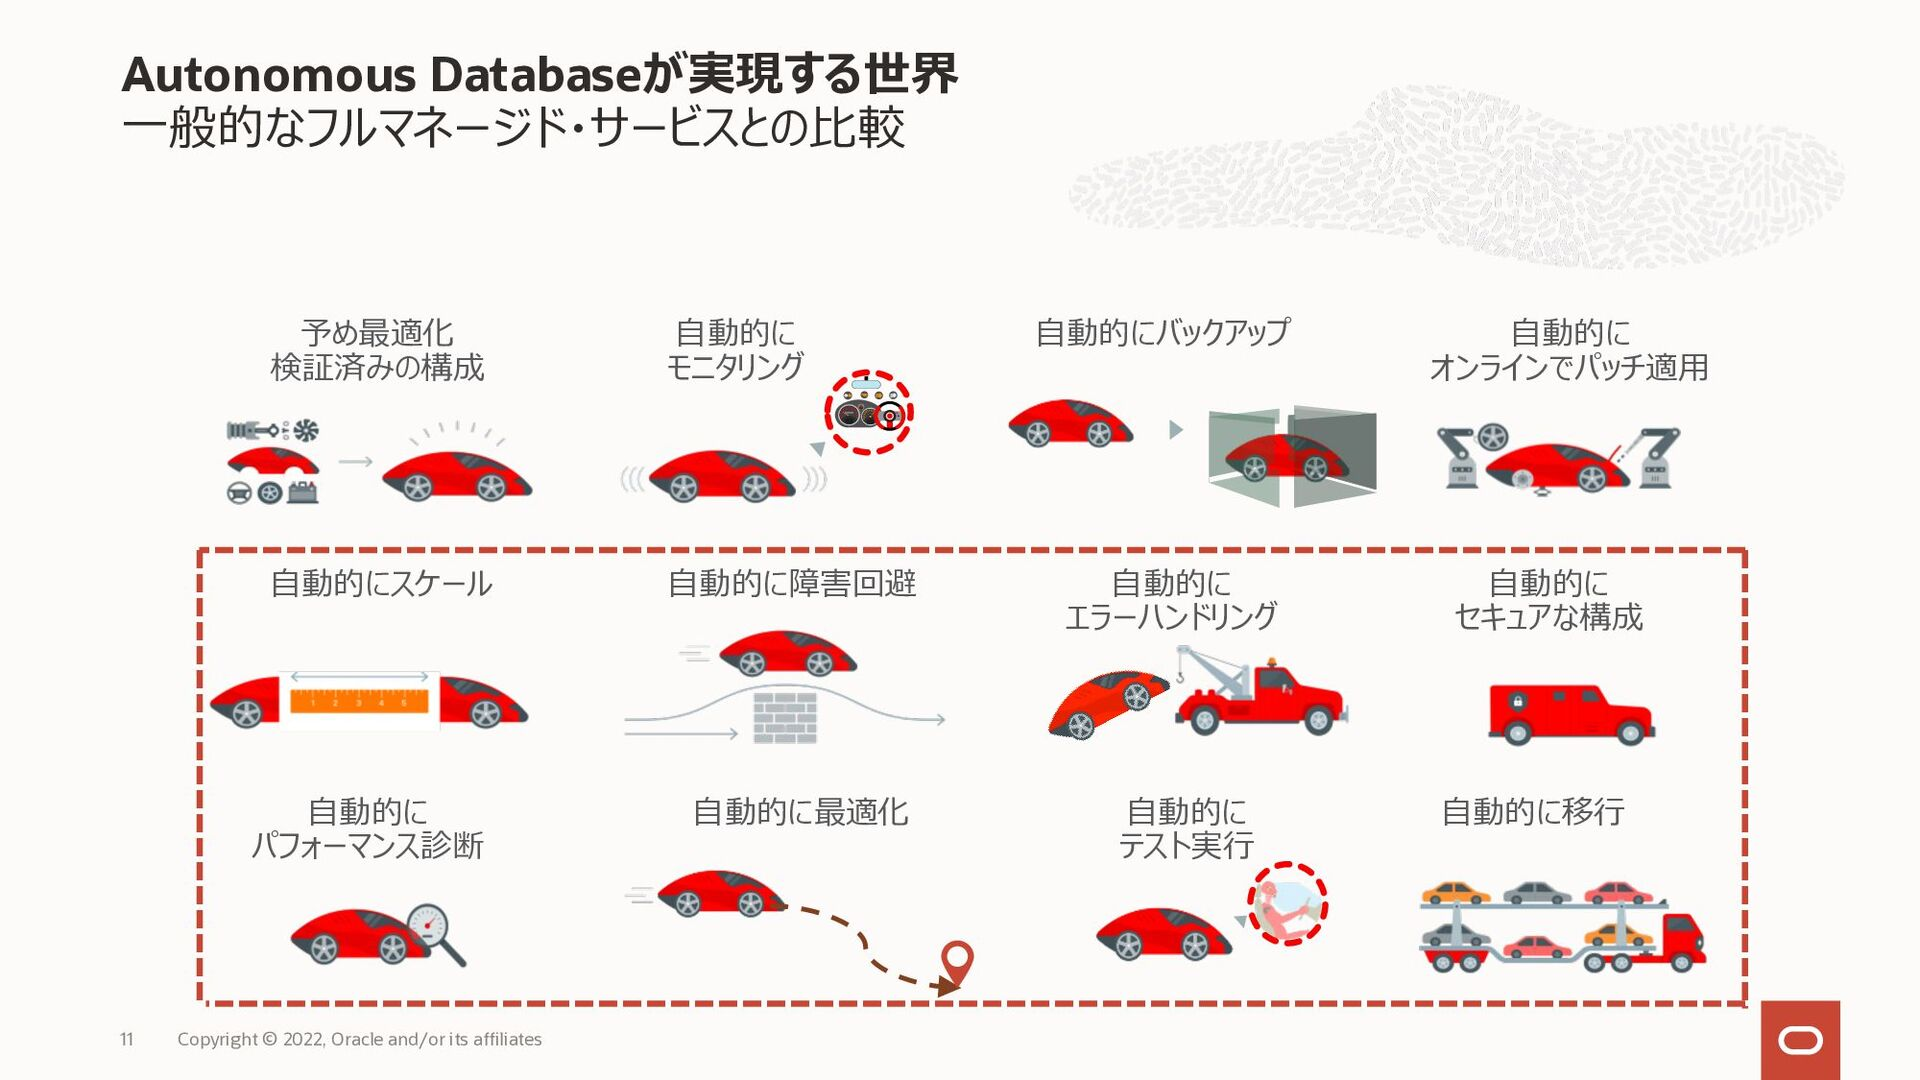 Autonomous Databaseを構成するテクノロジー Copyright © 2020...